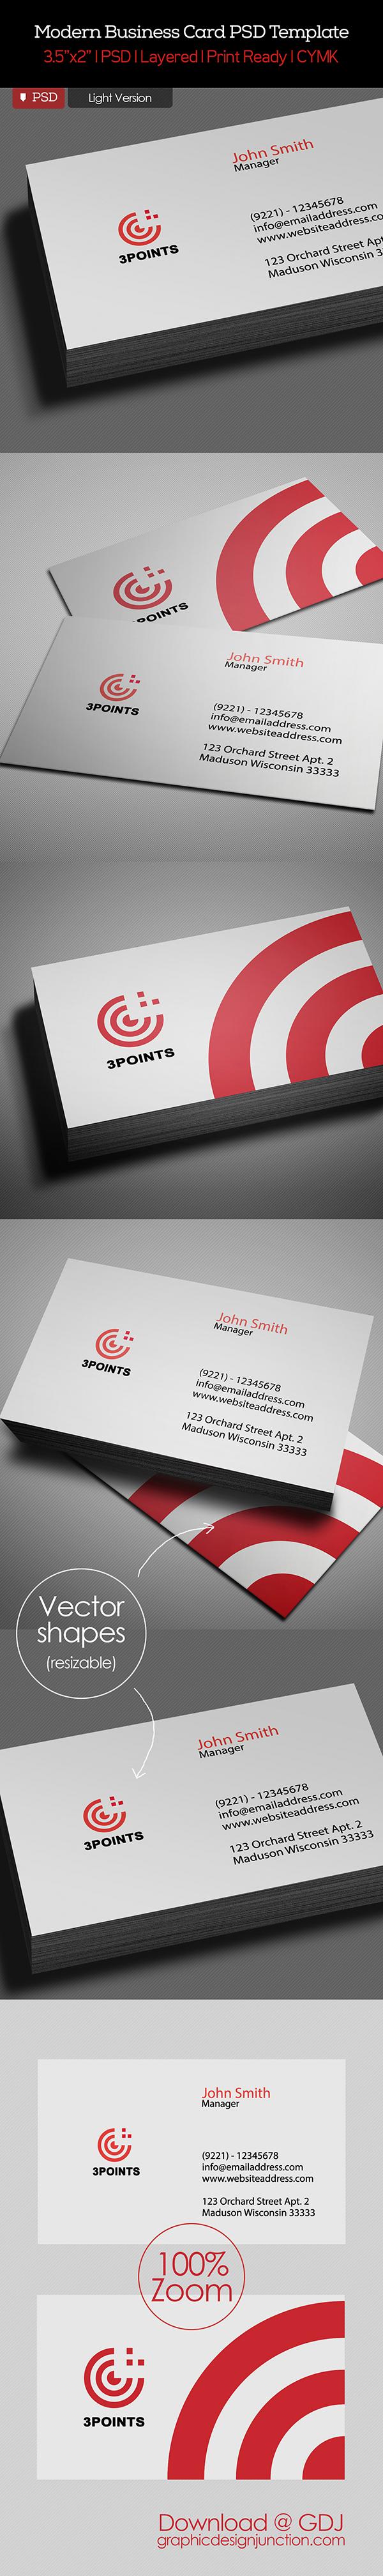 Free Business Card PSD Template Light Version